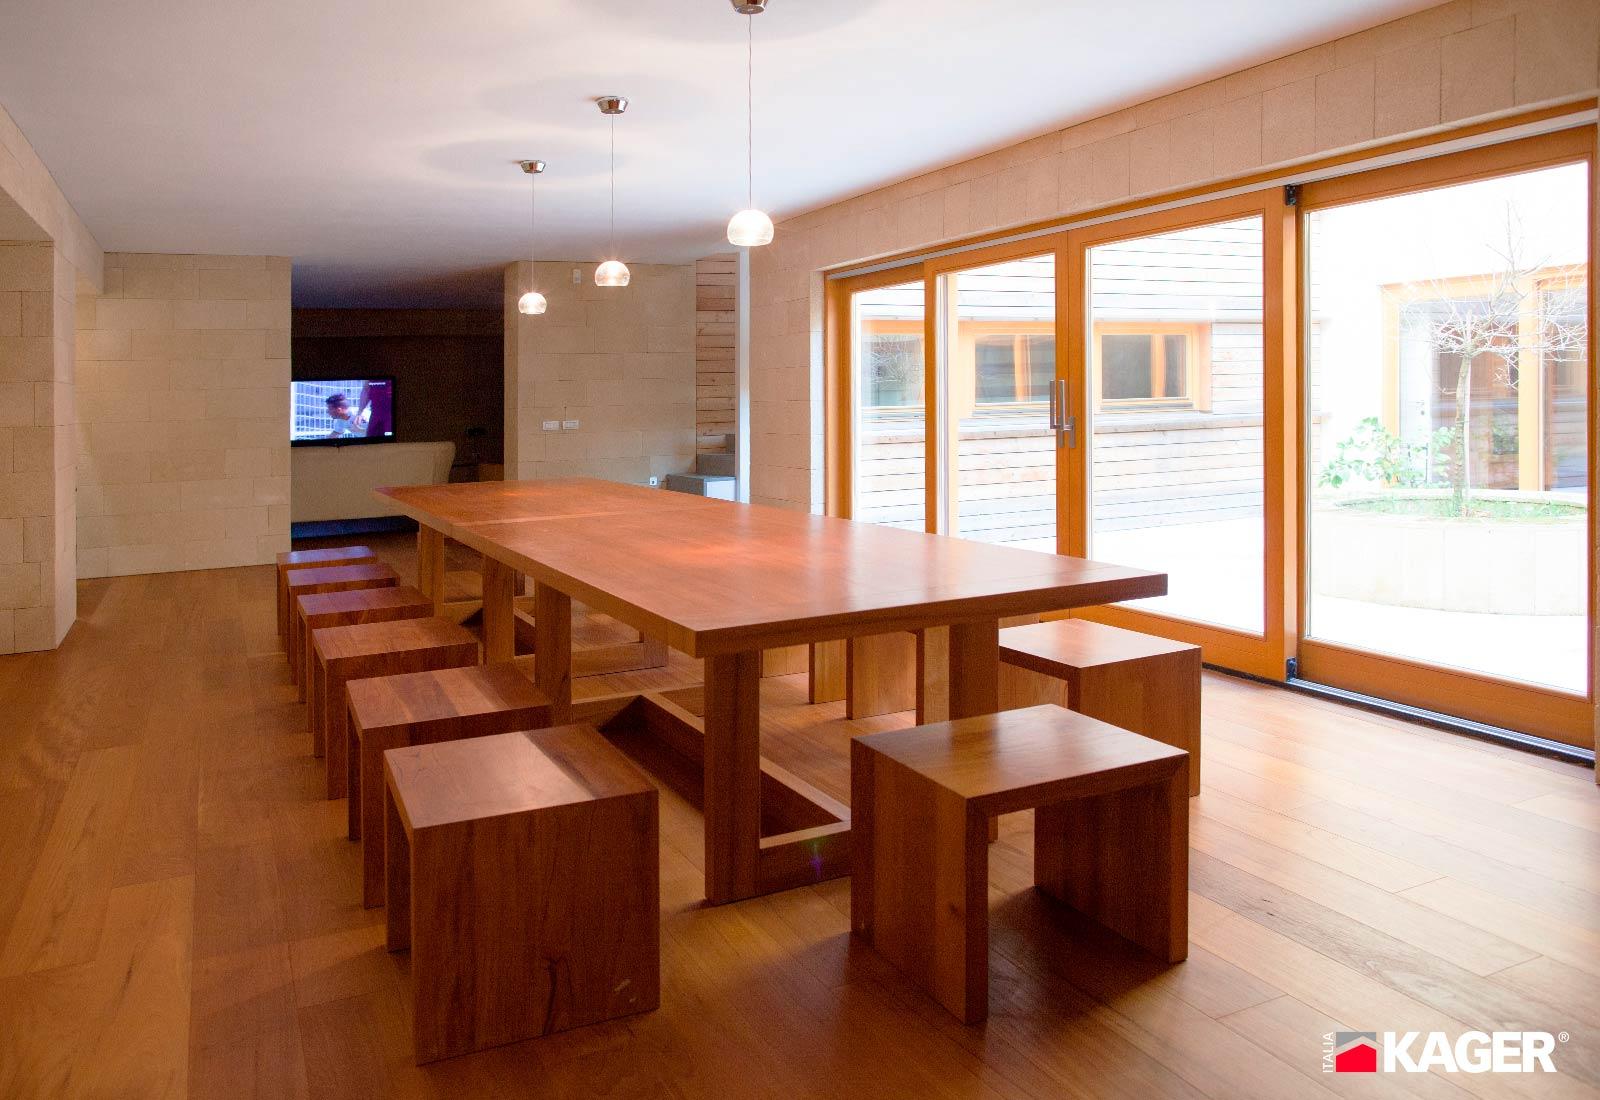 Casa-in-legno-Forli-Kager-Italia-13